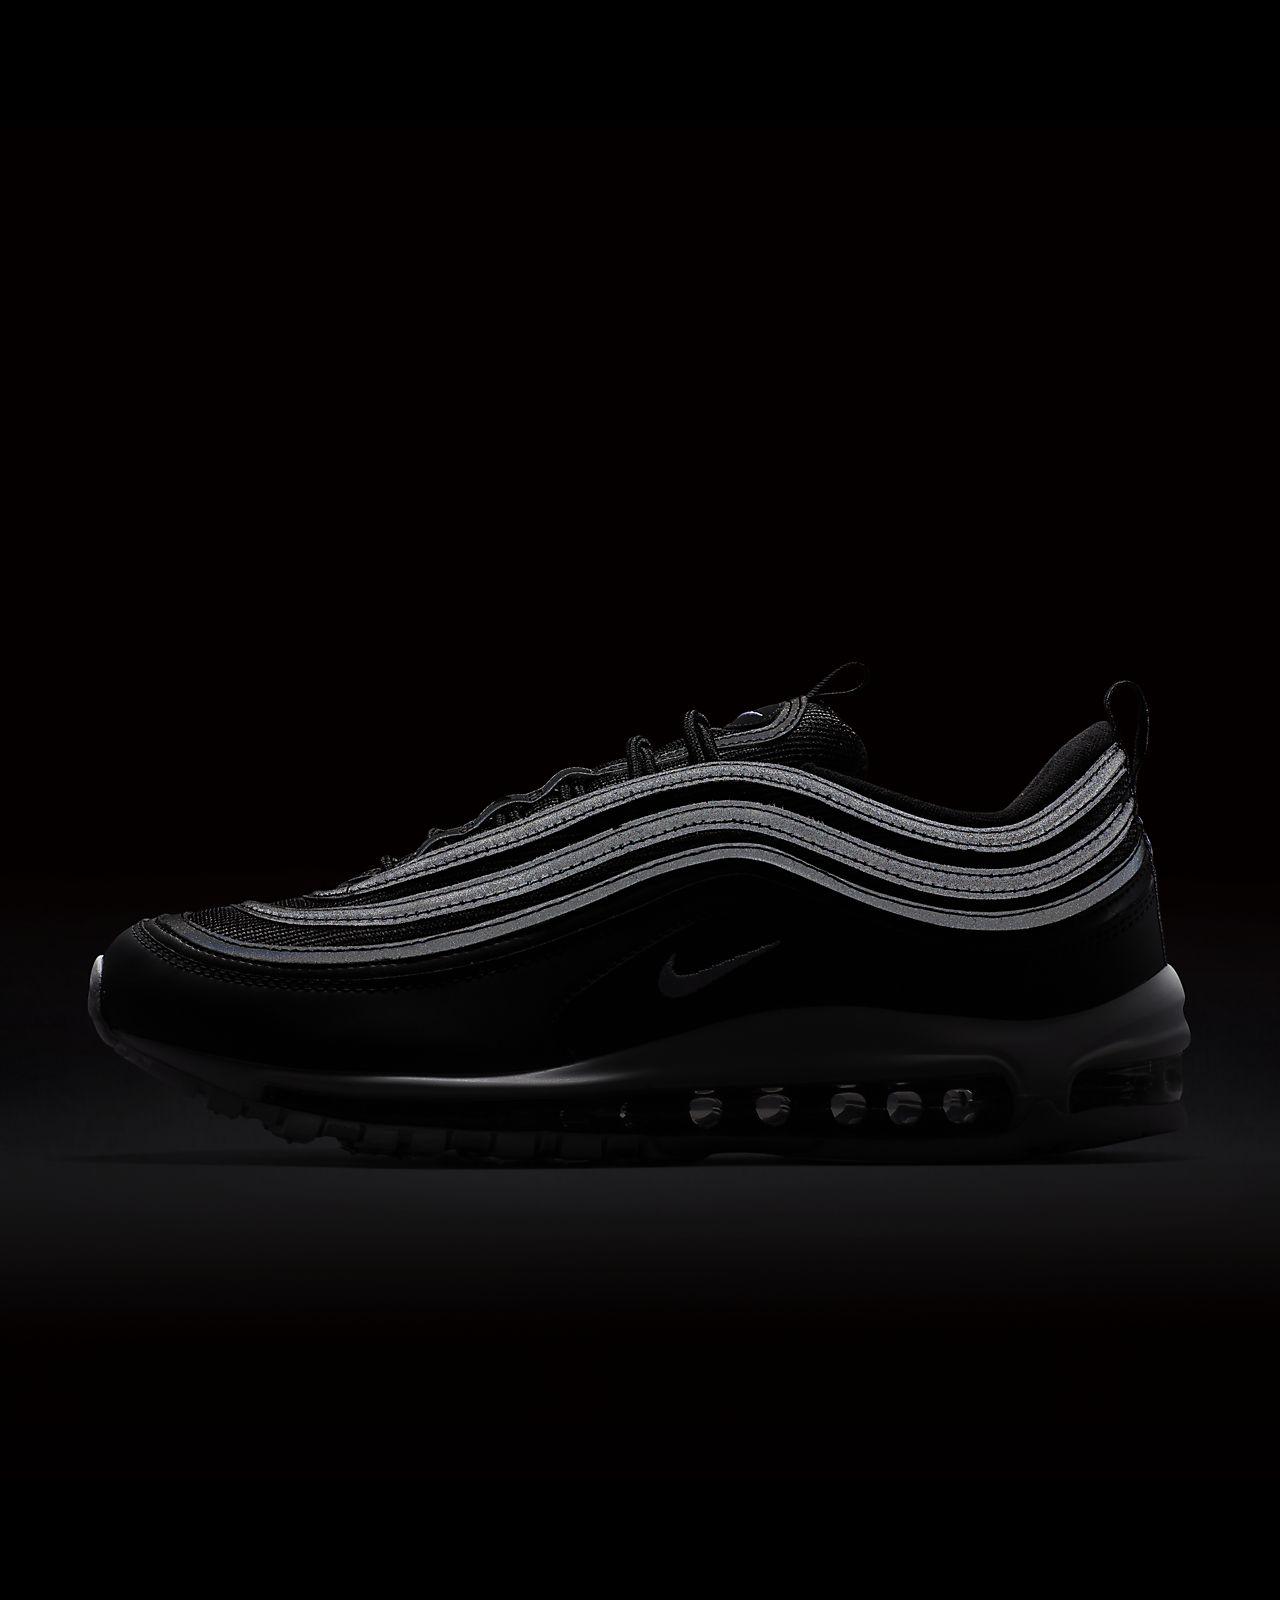 Nike Air Max 97 Shoes Men/'s Casual Sport Sneaker Black White 921826-001